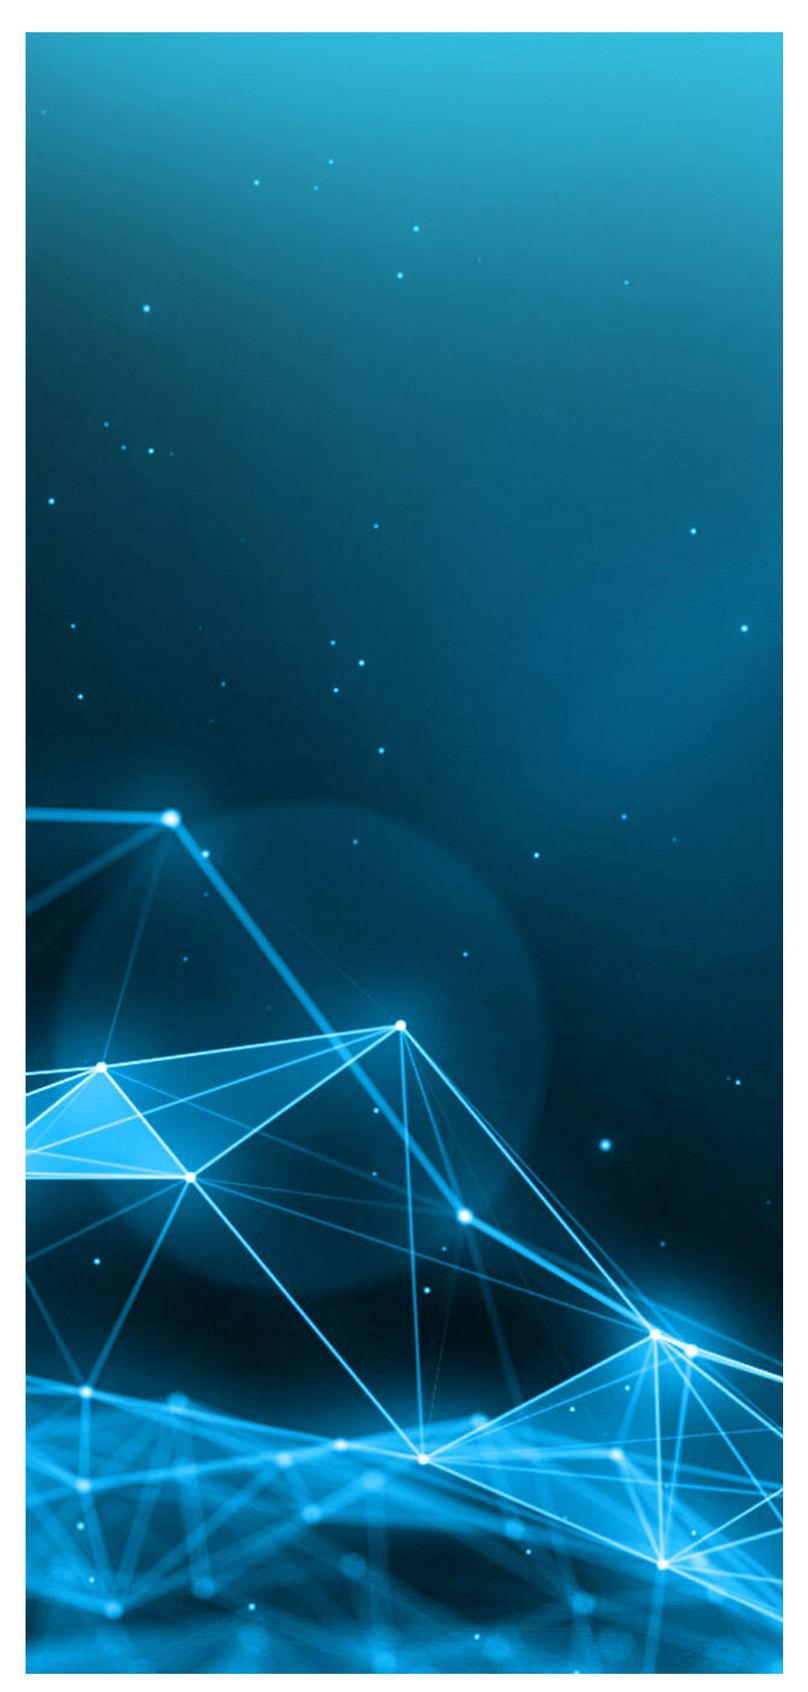 A Tecnologia Movel Wallpapers Imagem Gratis Fundos Numero